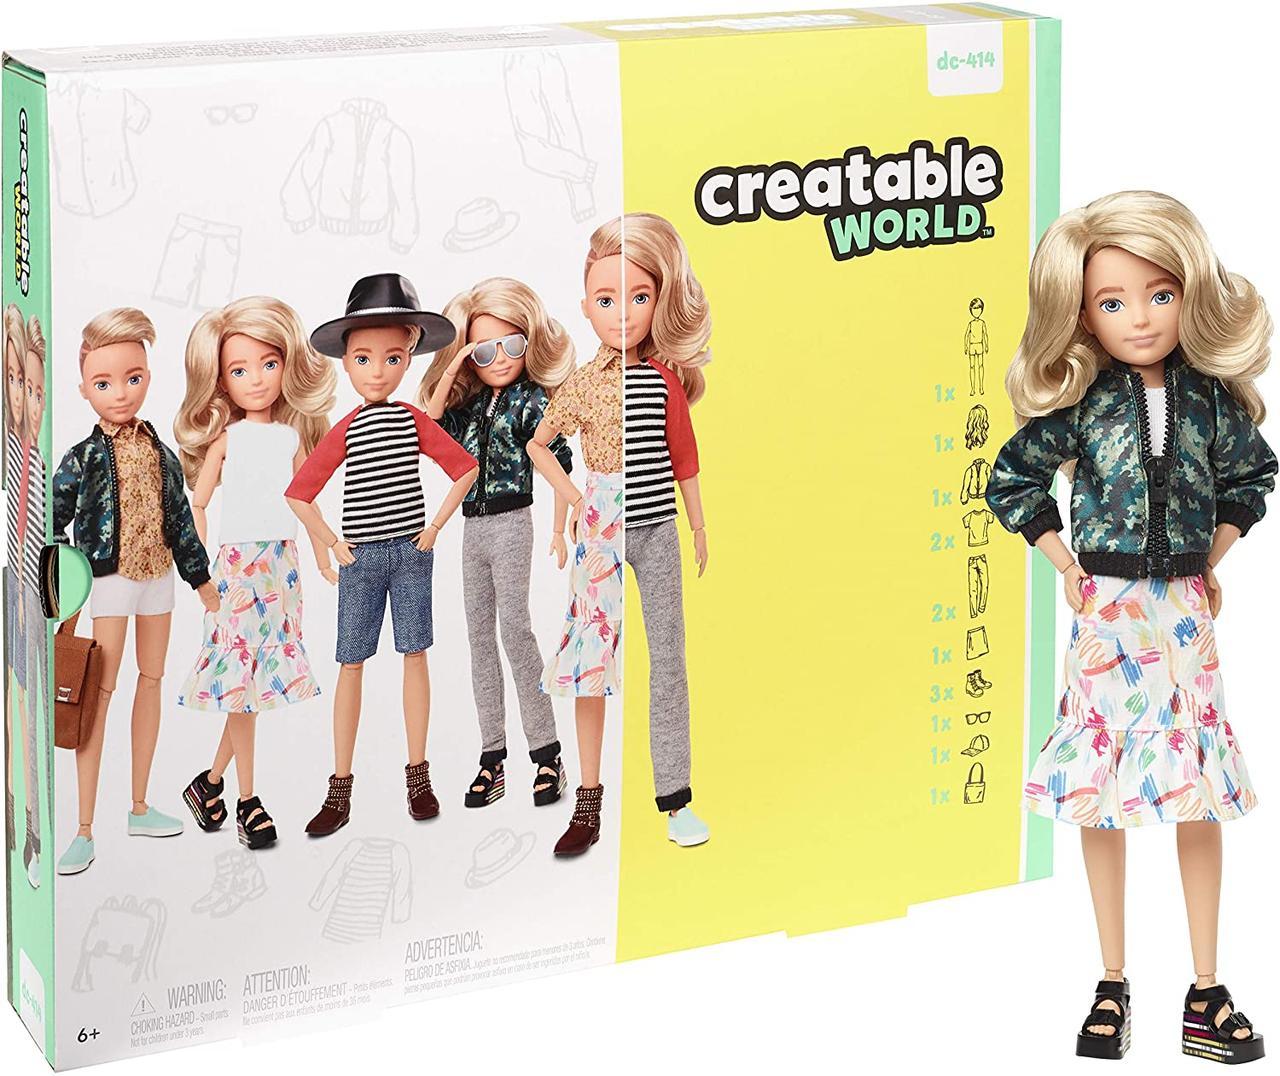 Кукла Создаваемый мир Светлые волнистые волосы Creatable World Character Kit CustomizableDoll Blonde Wavy Hair